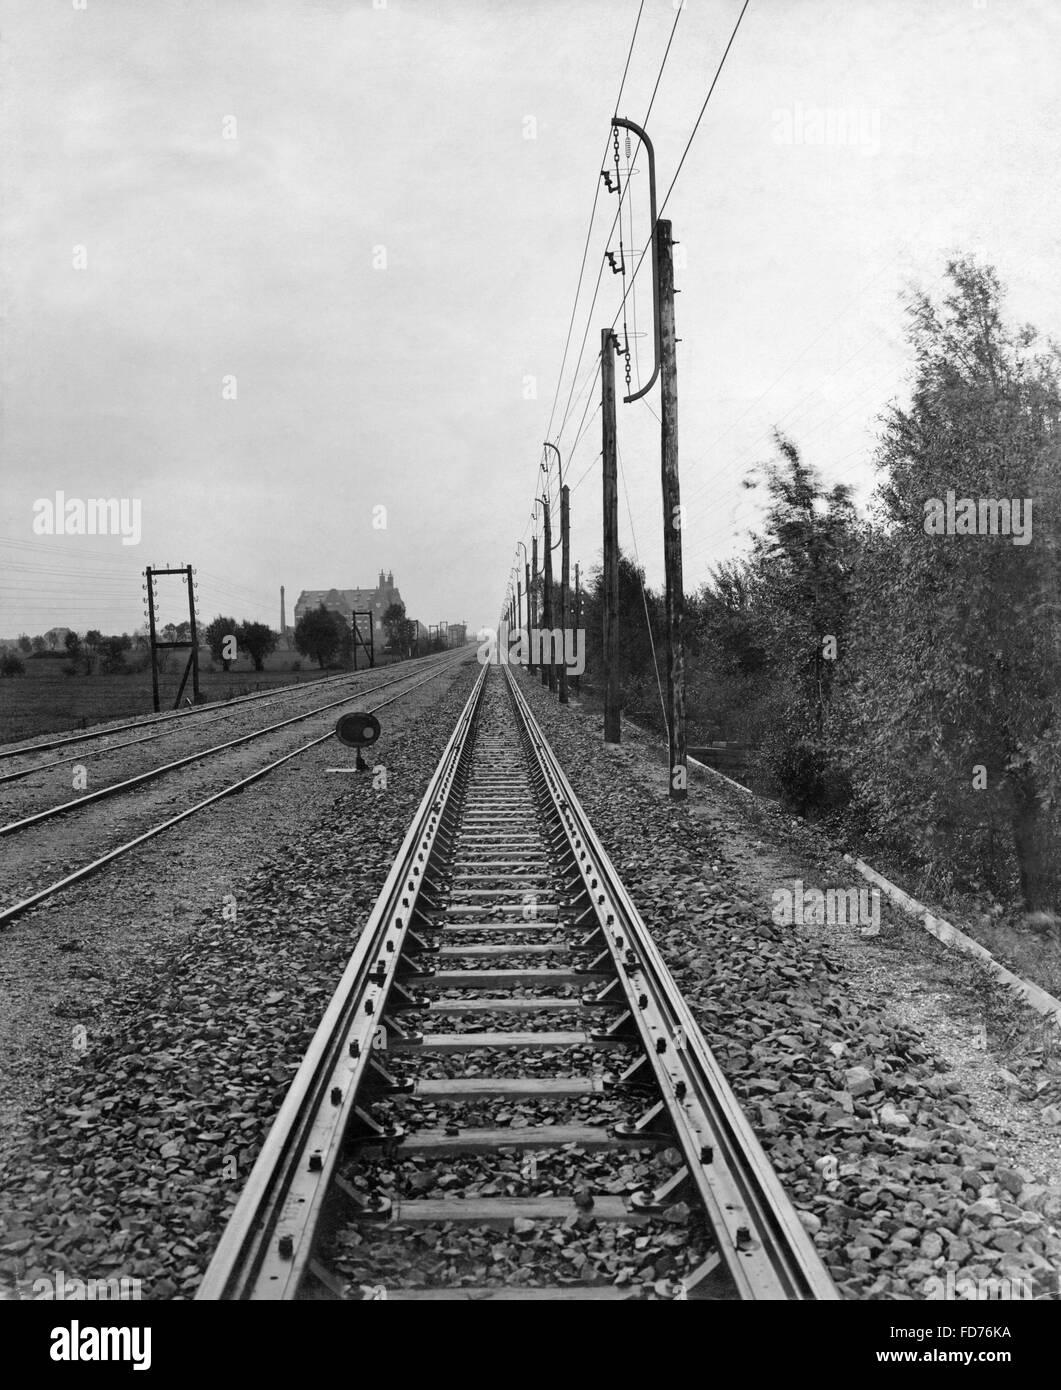 Tracks, 1905 - Stock Image